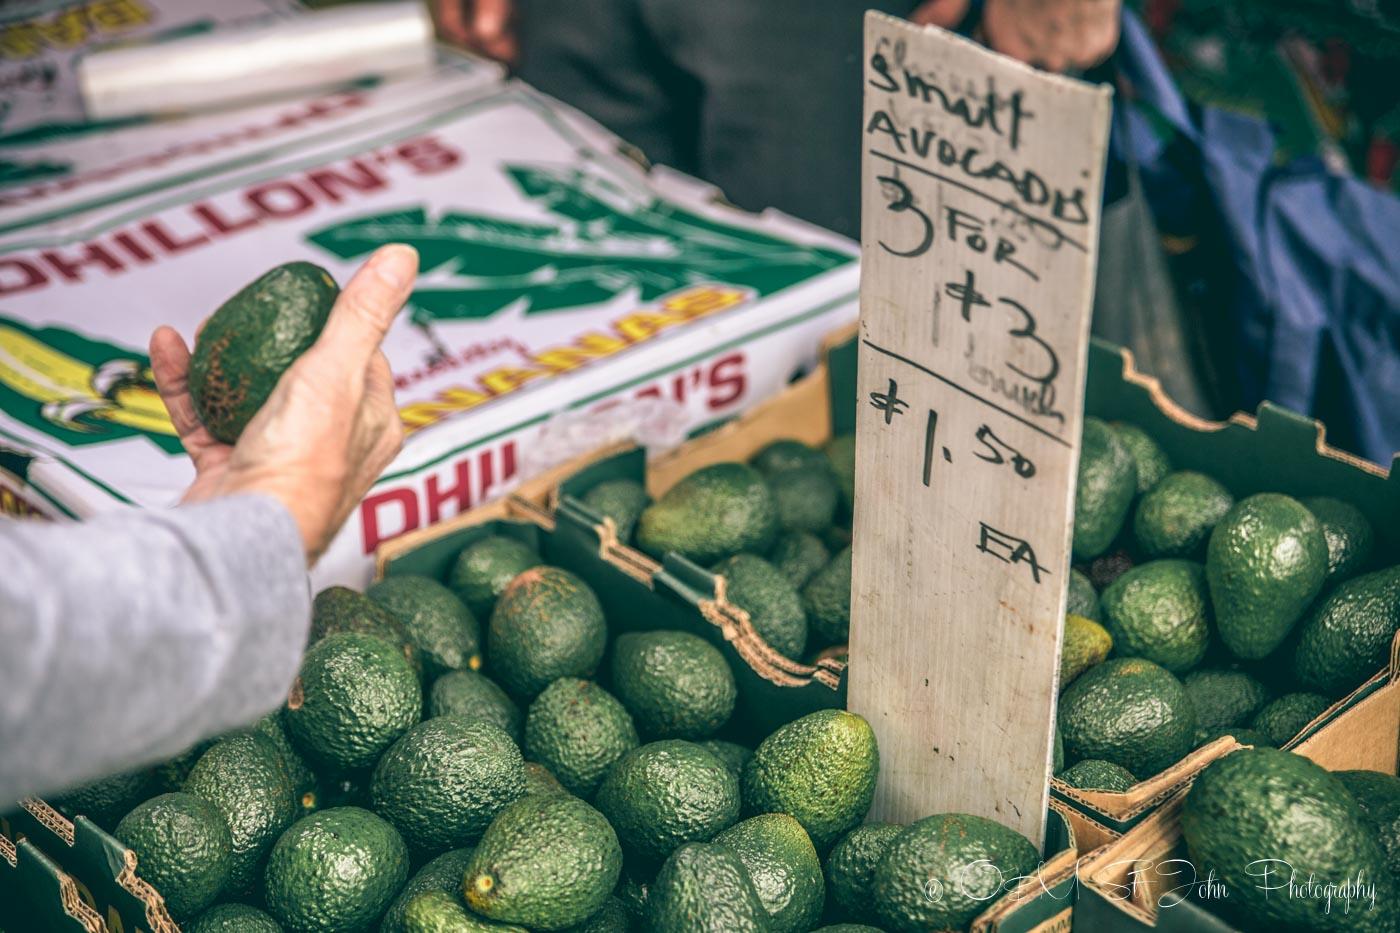 Australia Travel tips: Farmers market selling vegetables and food in Brisbane. Australia